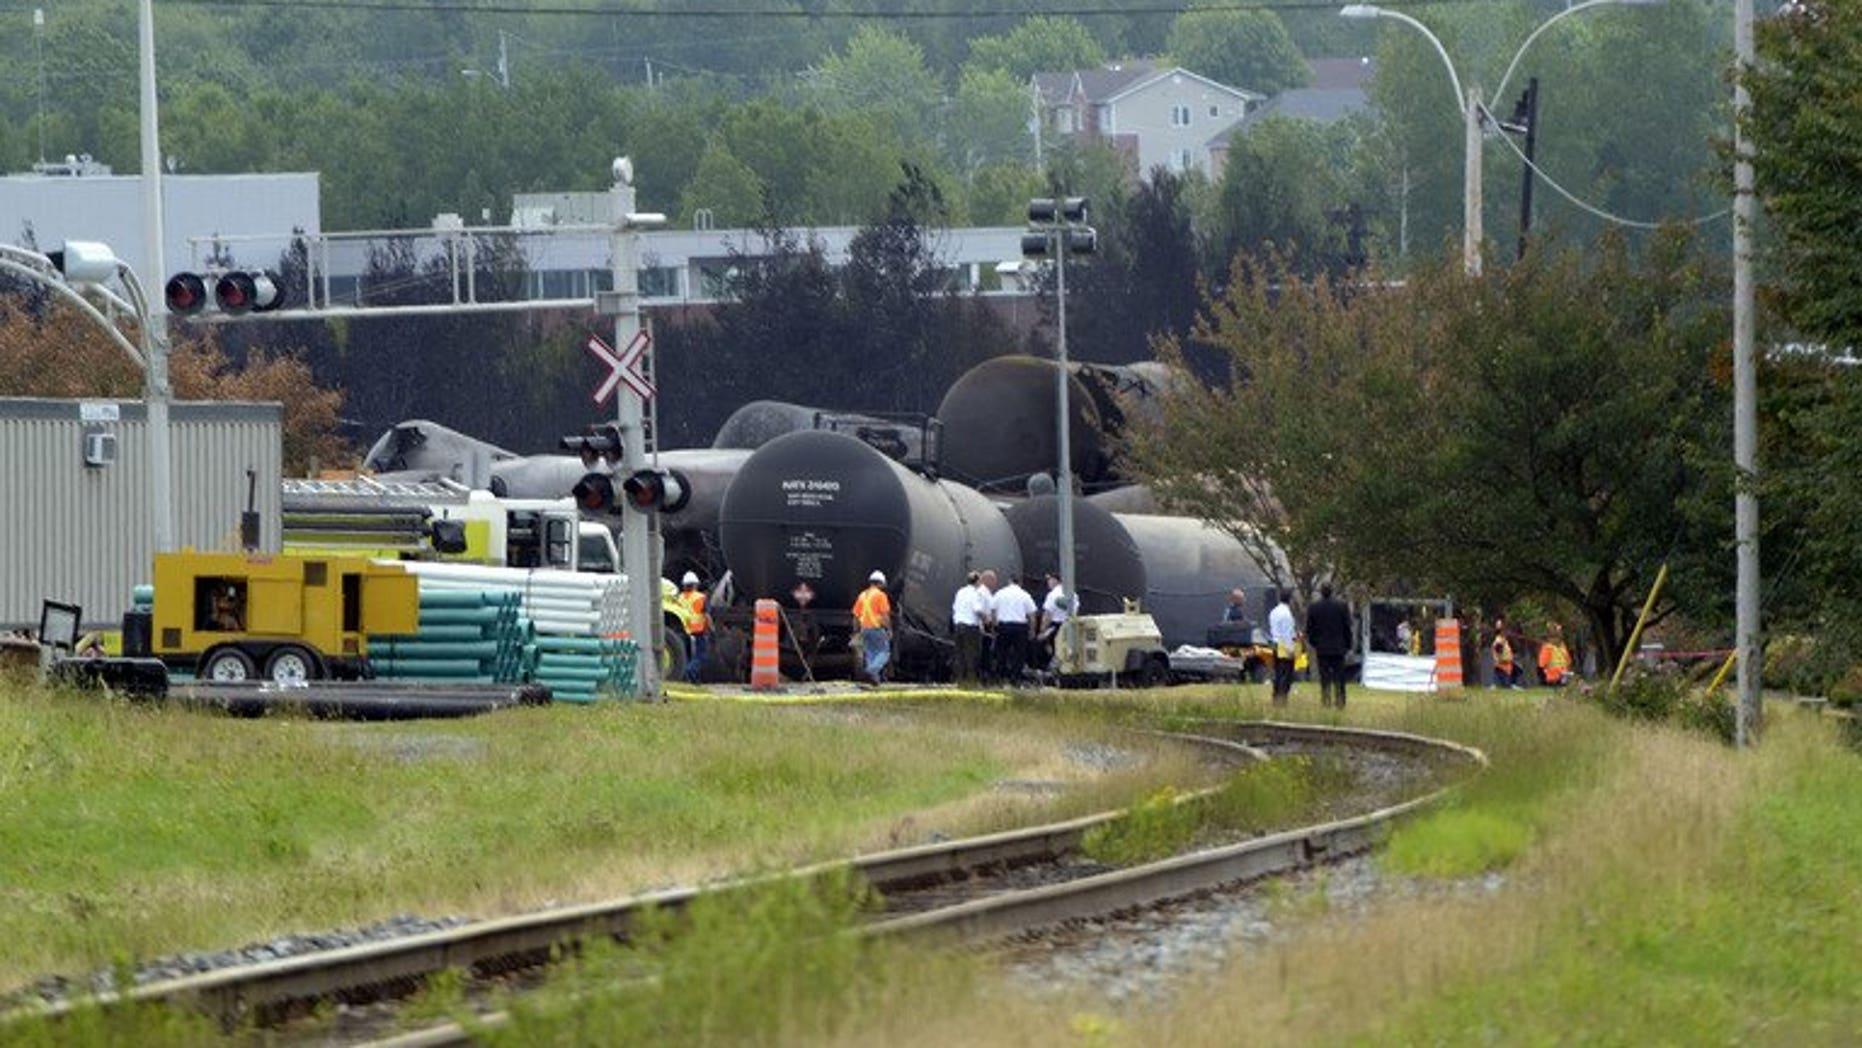 Investigators work at a train derailment site July 9, 2013 in Lac-megantic, Quebec, Canada.